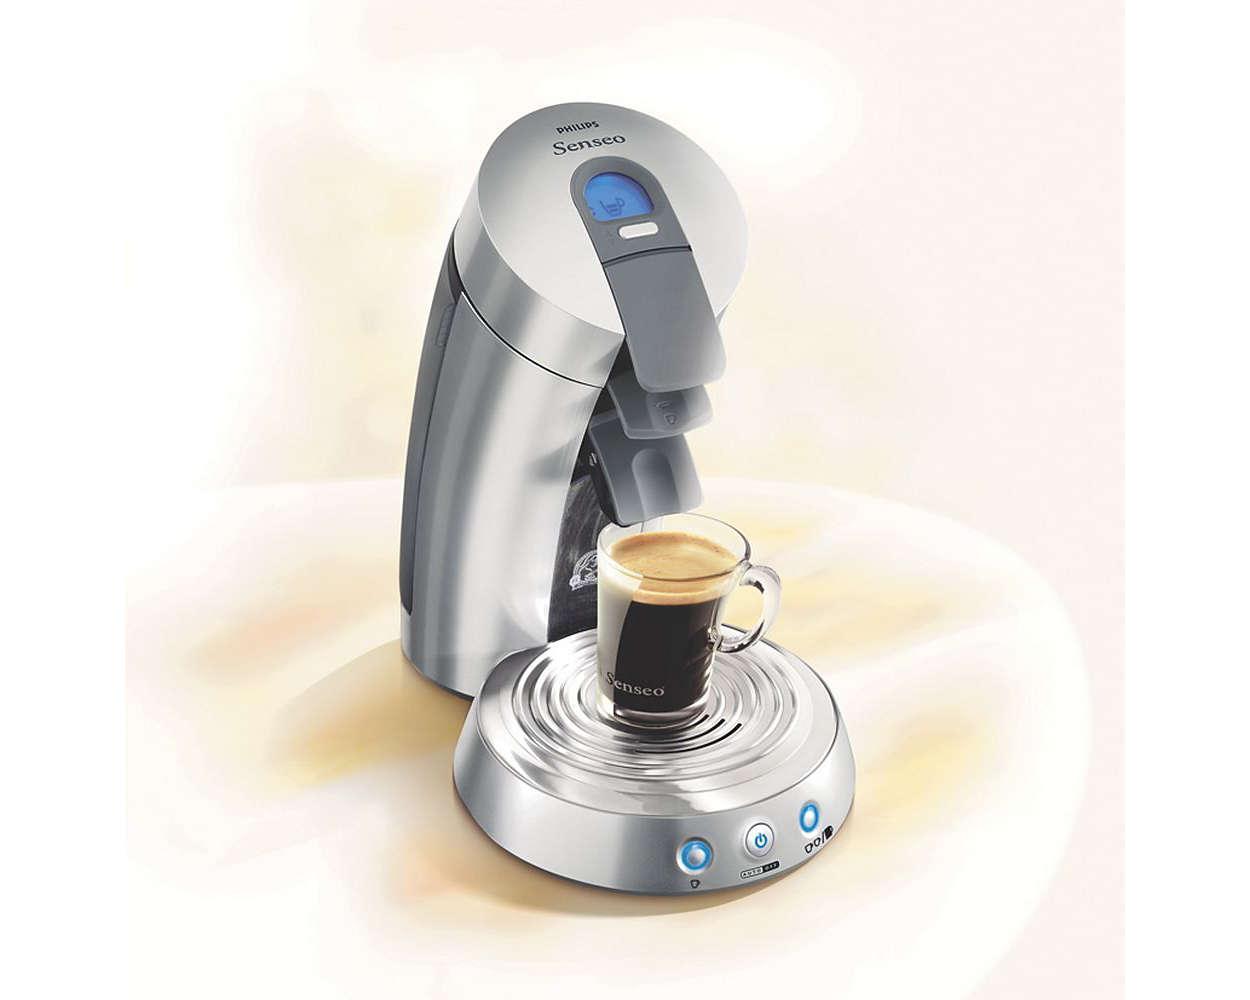 Simply good drip filter coffee